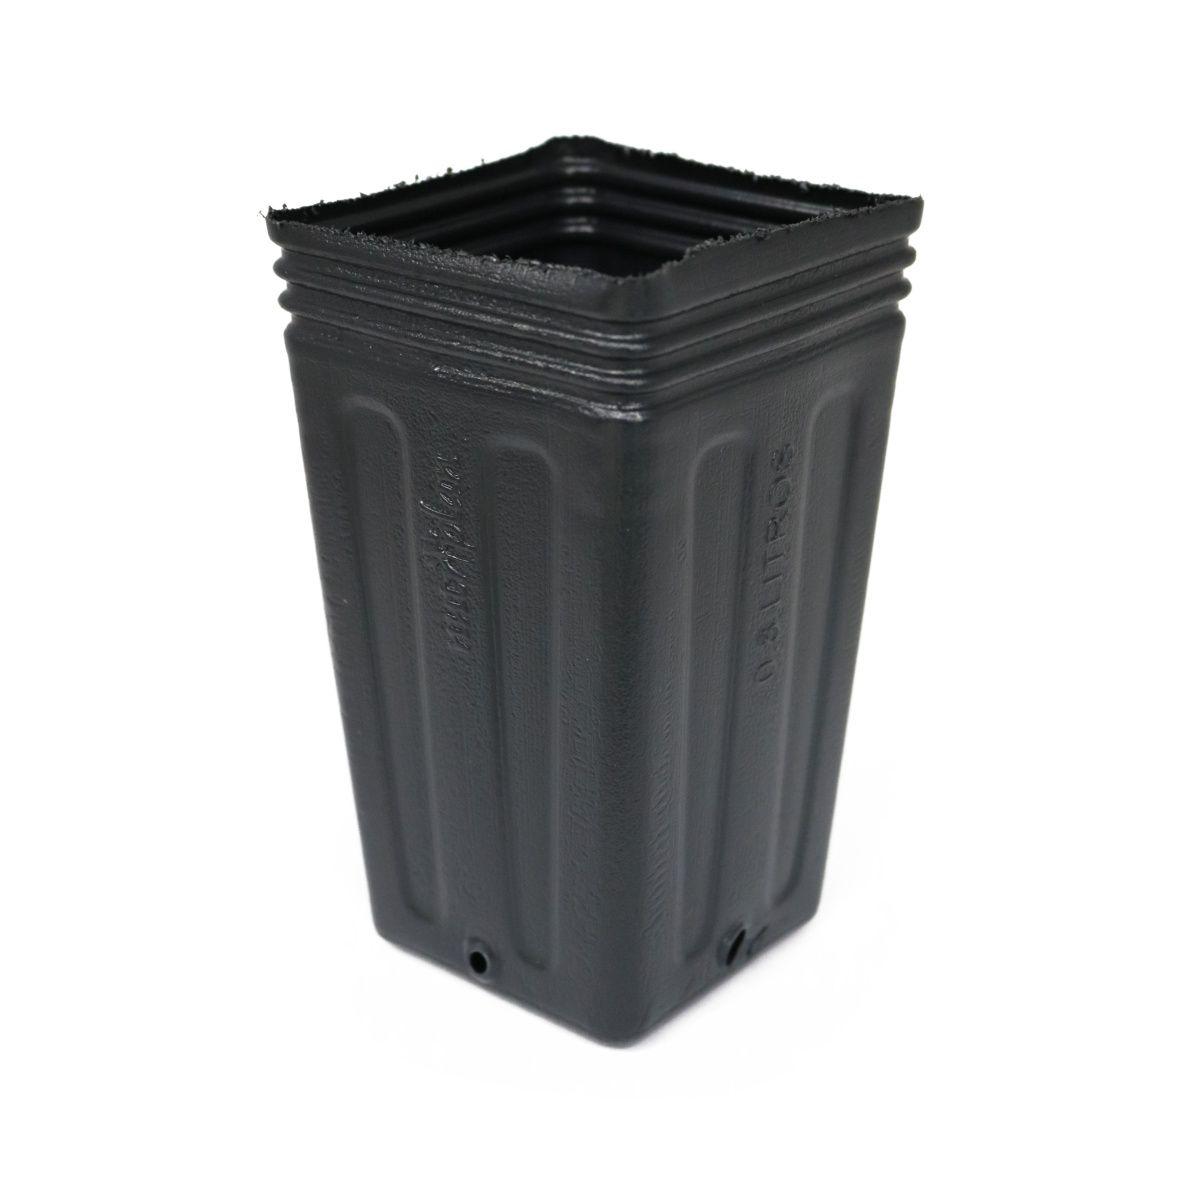 Vaso (embalagem) para mudas pote 0,8 litros